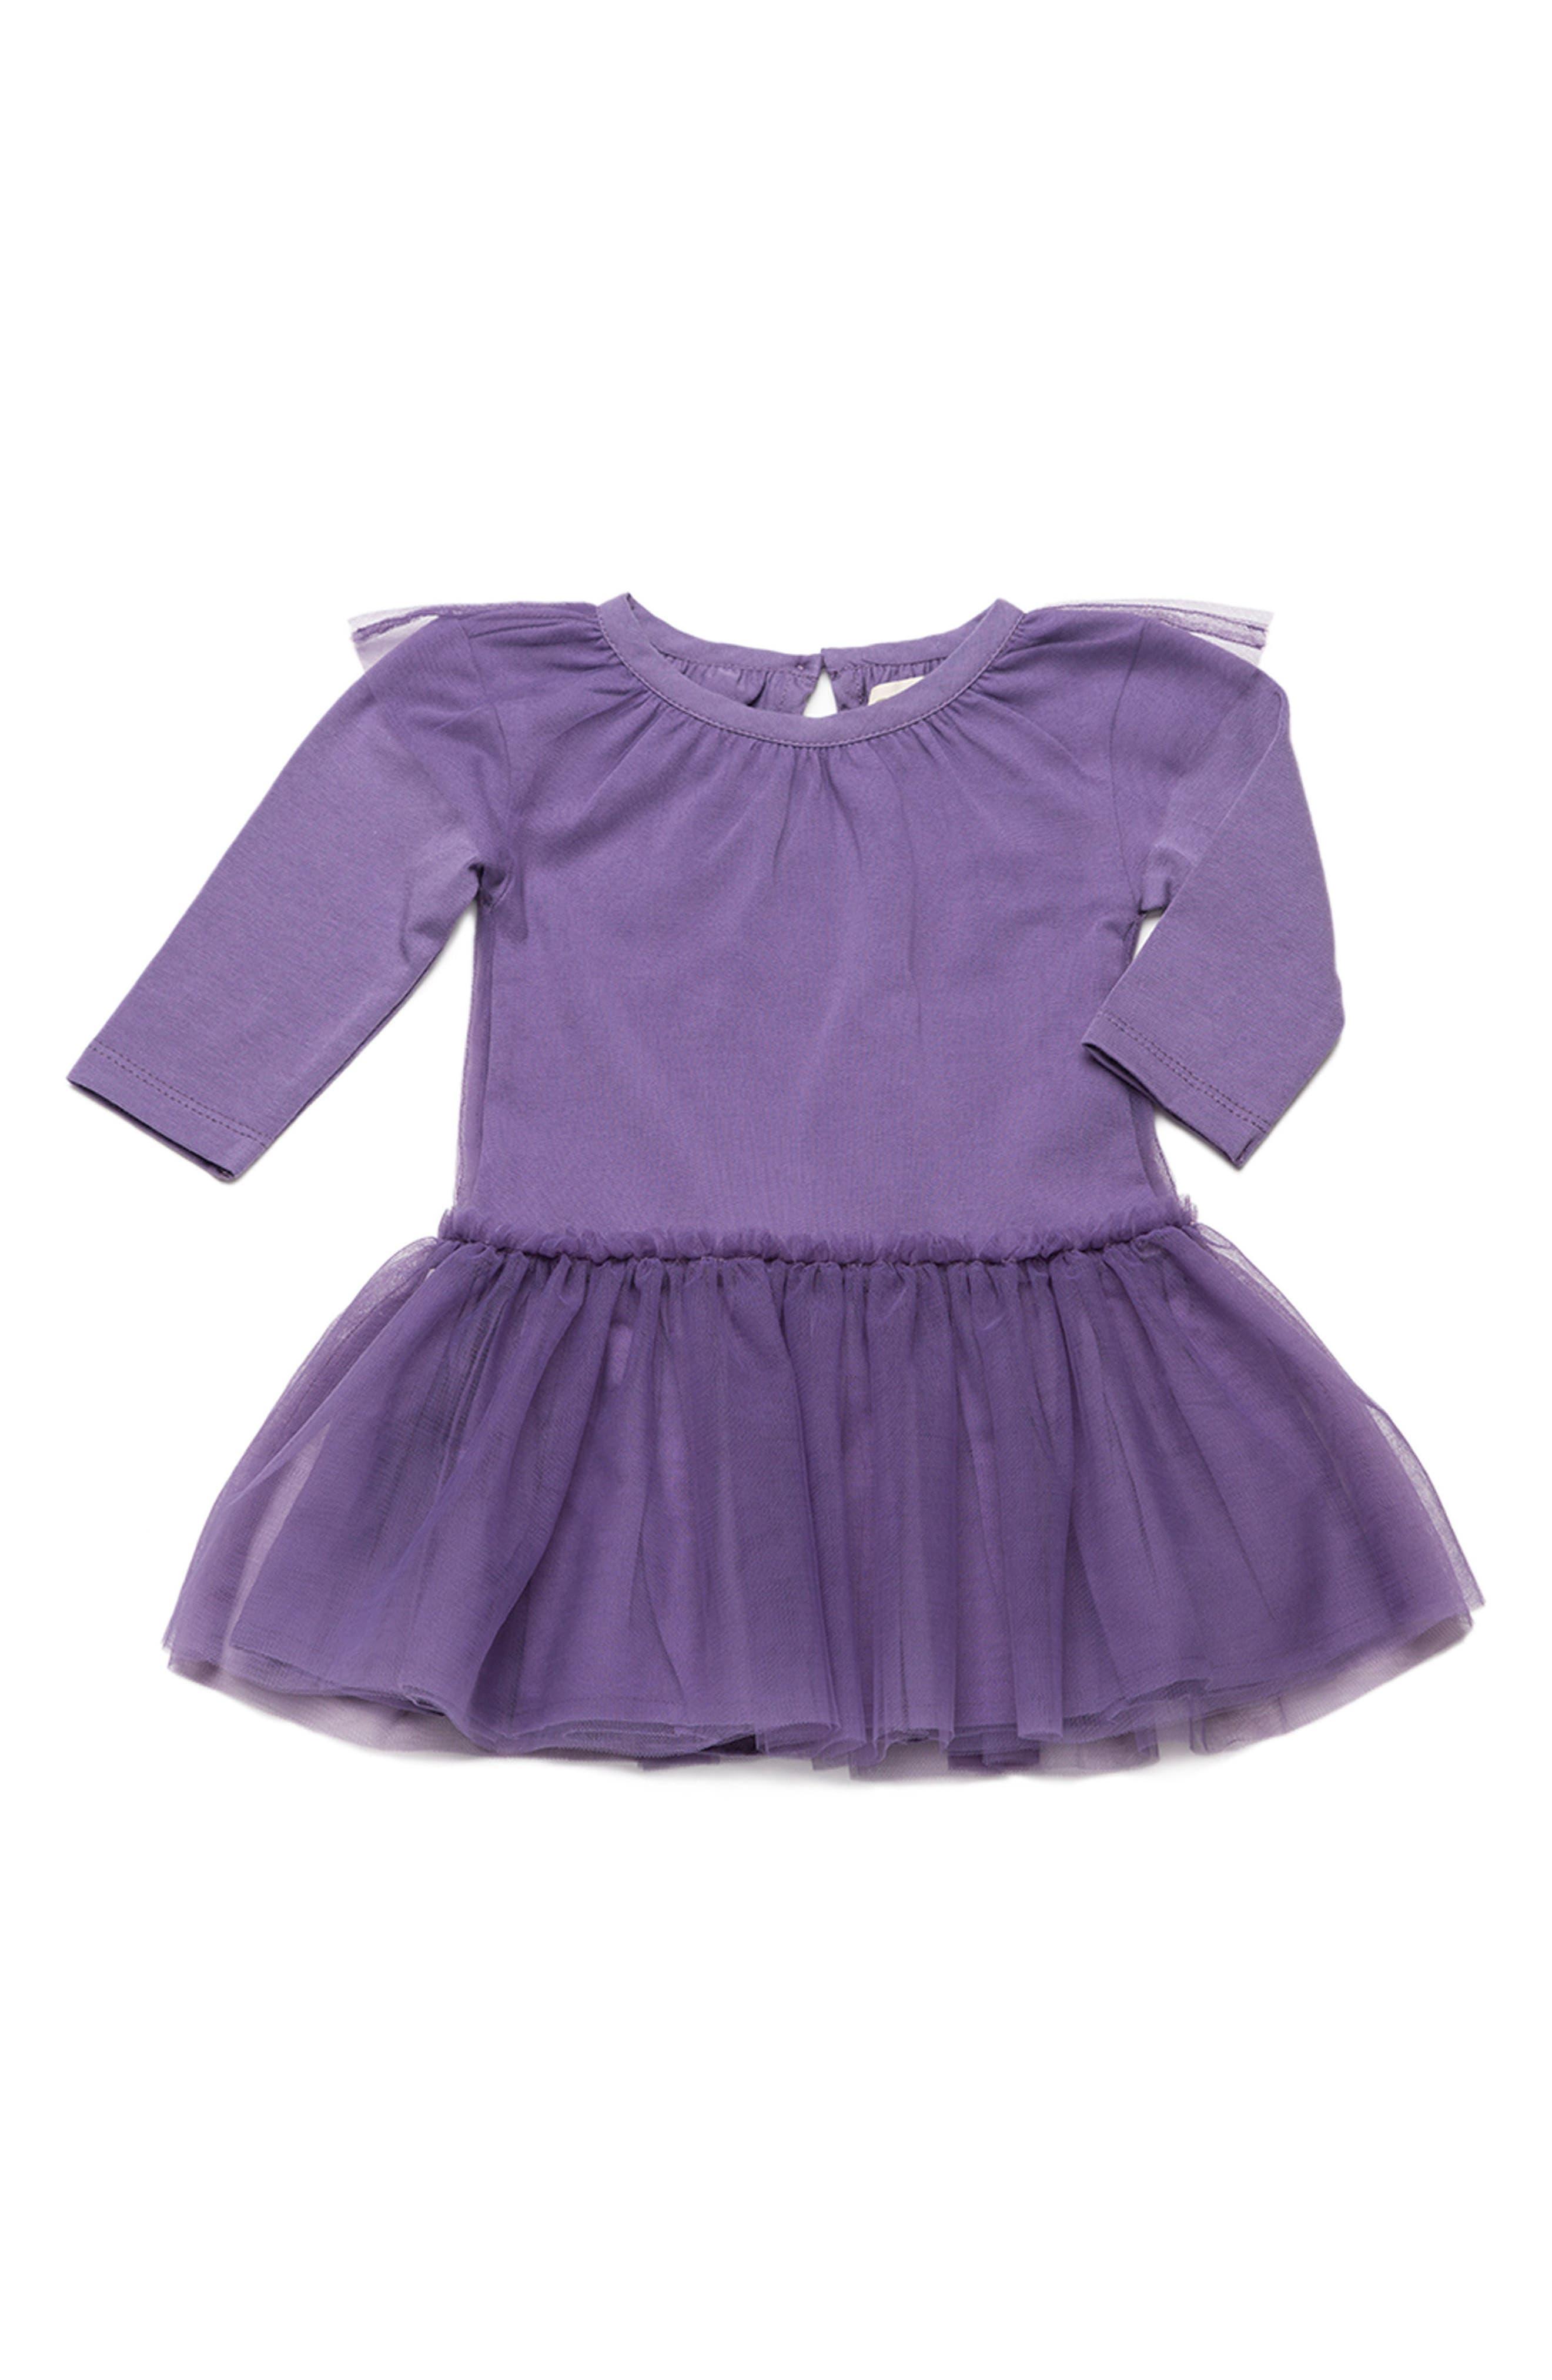 Little Belle Tulle Dress,                             Main thumbnail 1, color,                             500